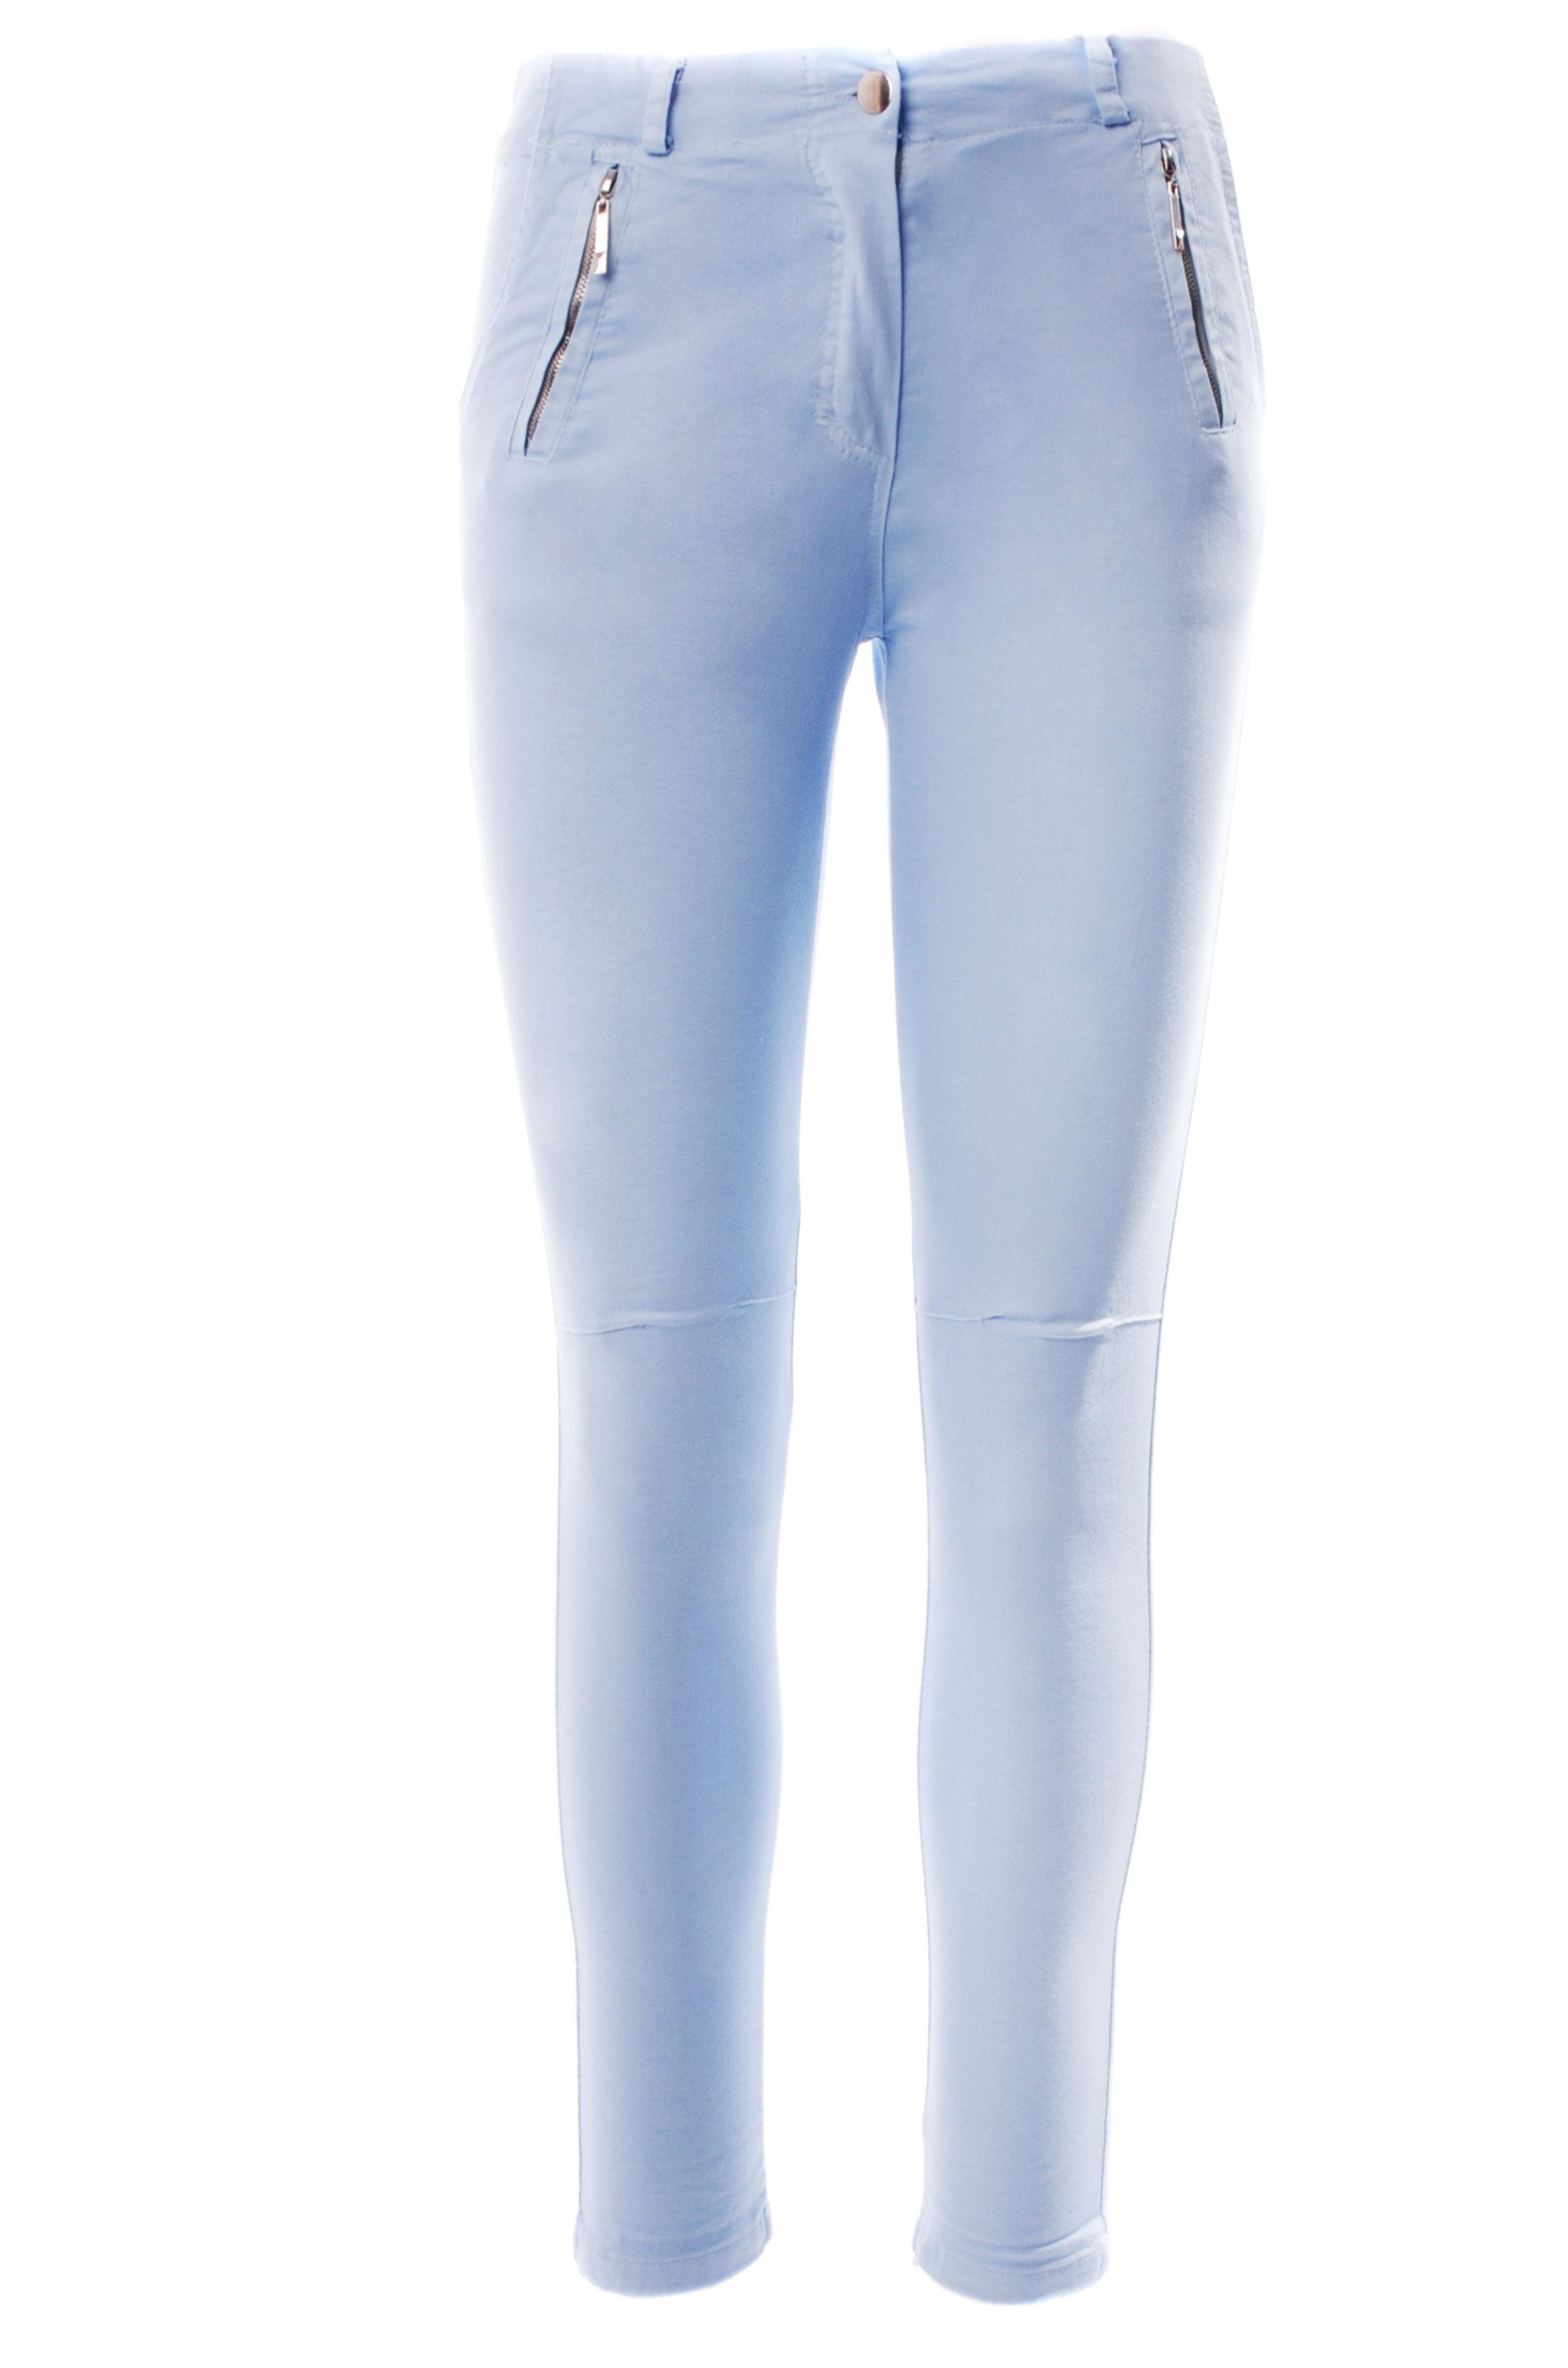 Spodnie - 10-2892 CIELO - Unisono